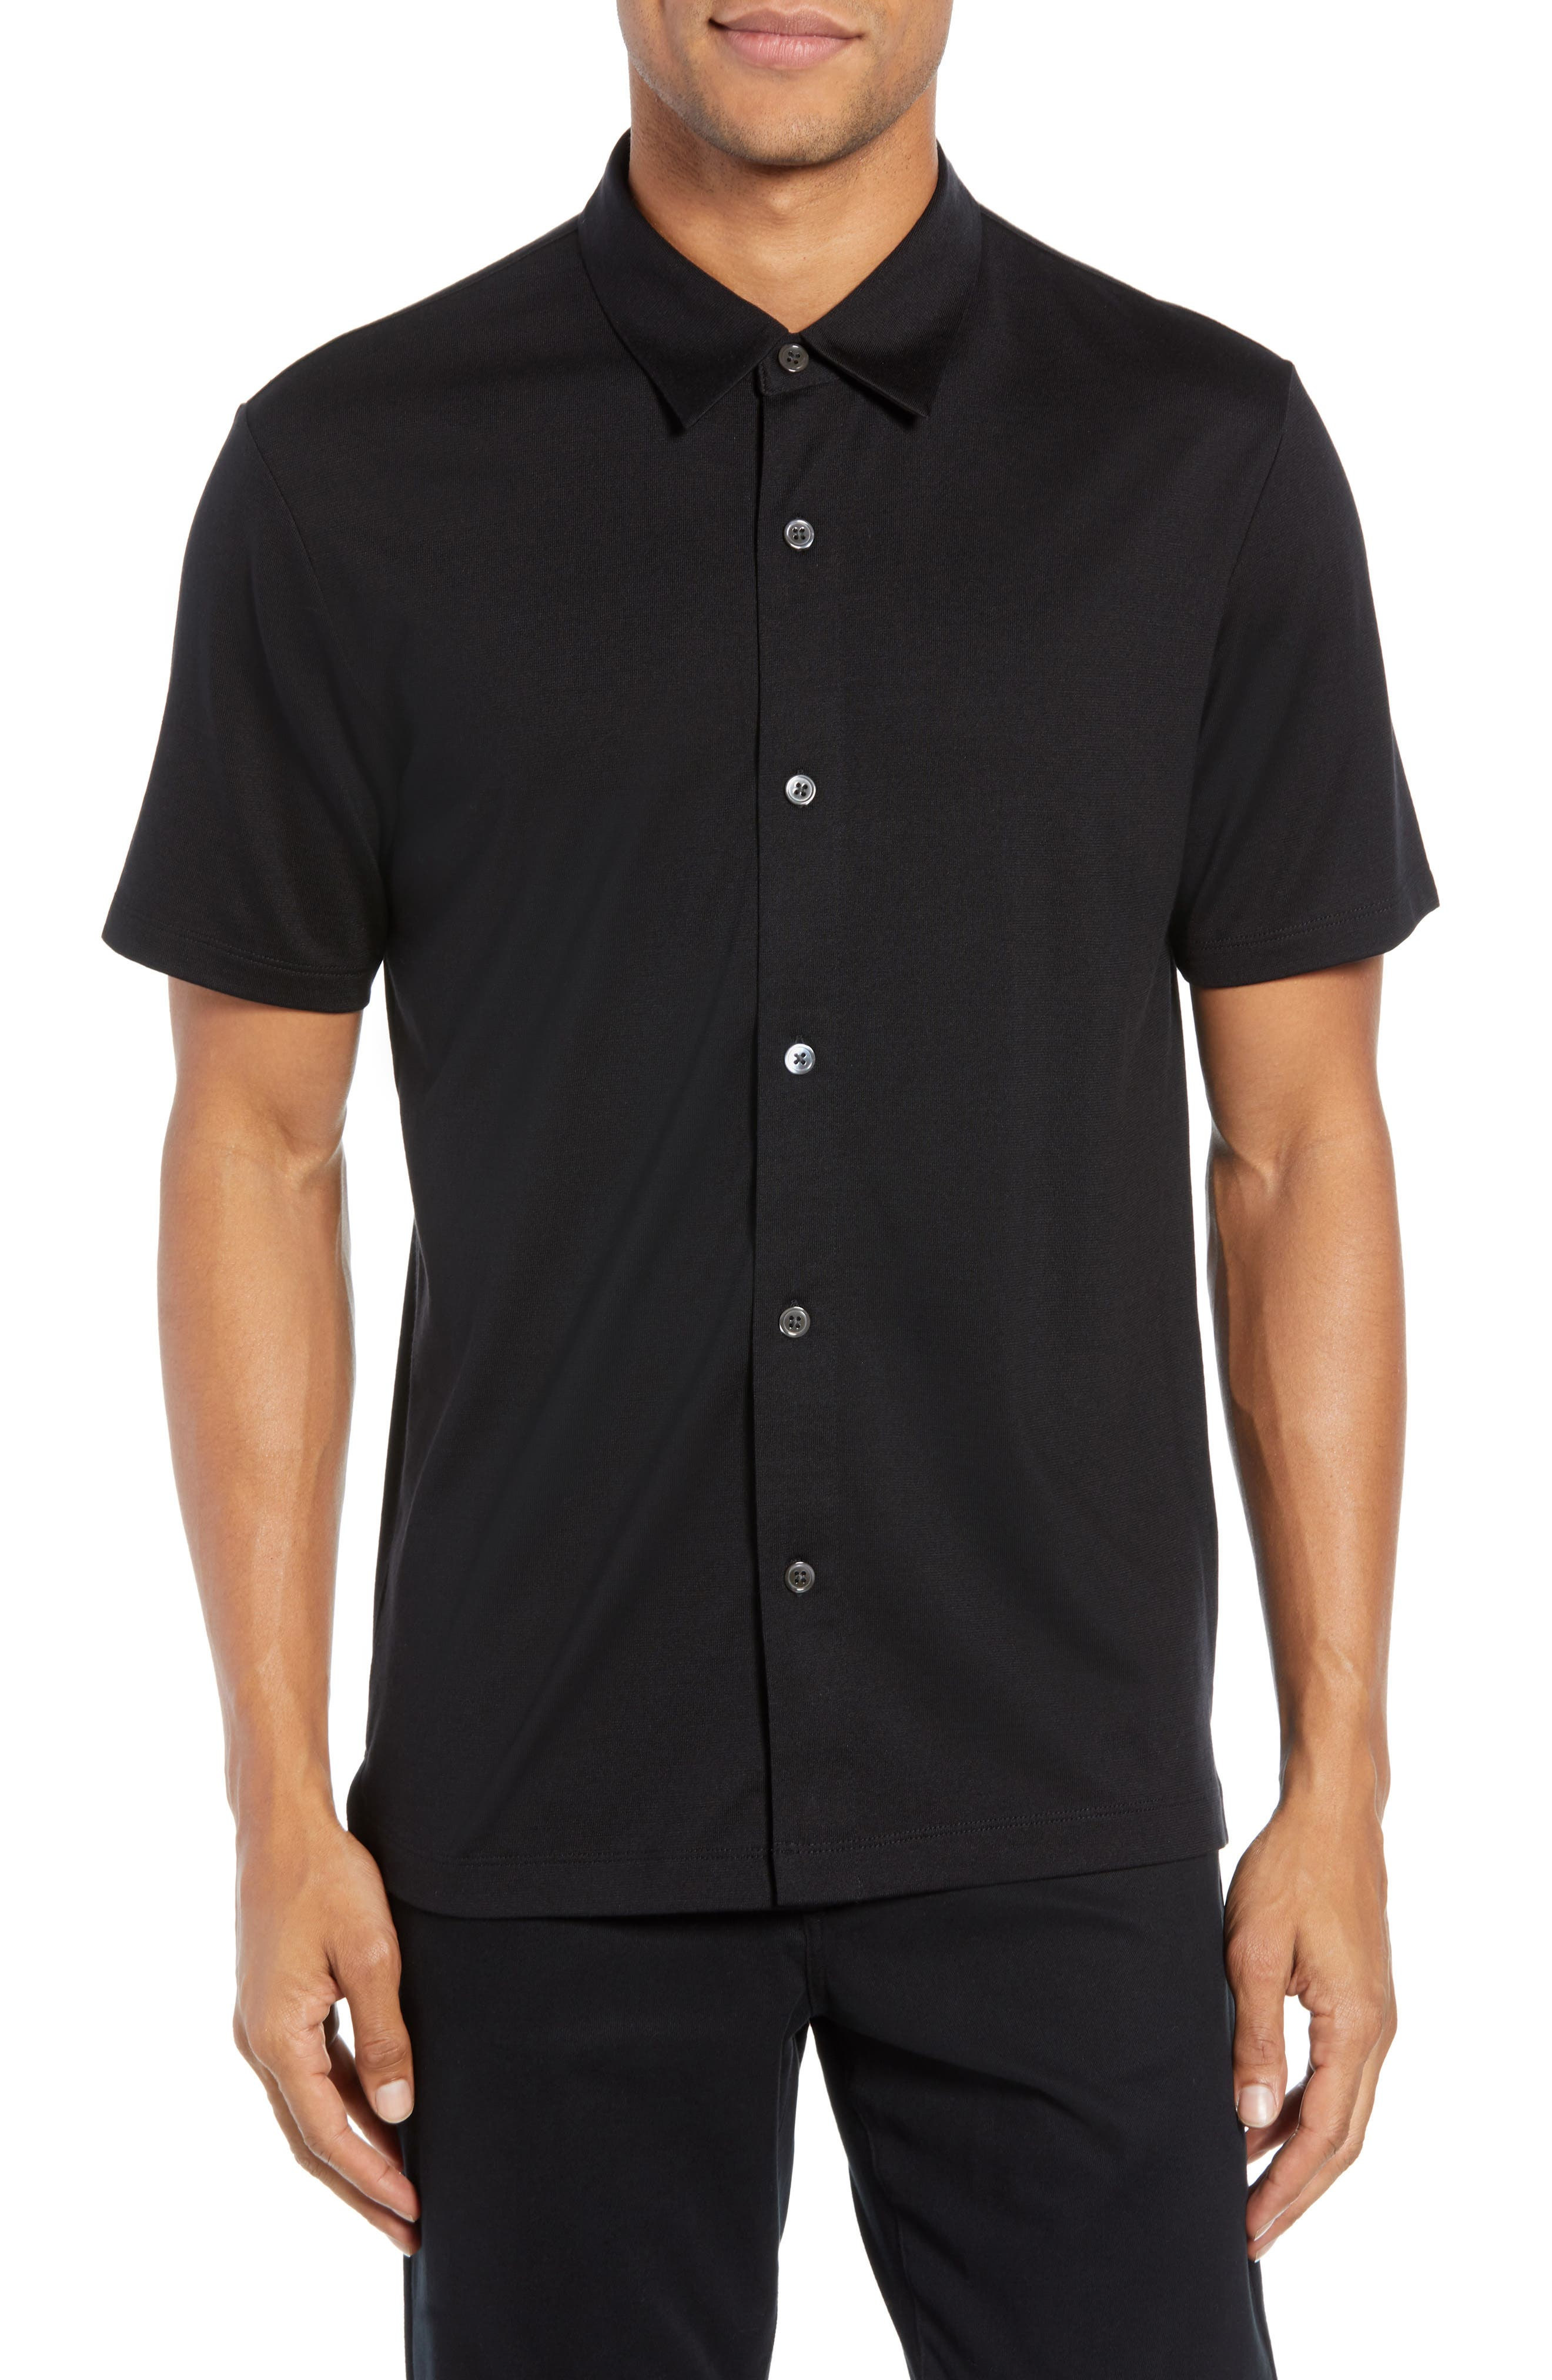 Incisi Slim Fit Knit Silk Blend Shirt,                         Main,                         color, BLACK